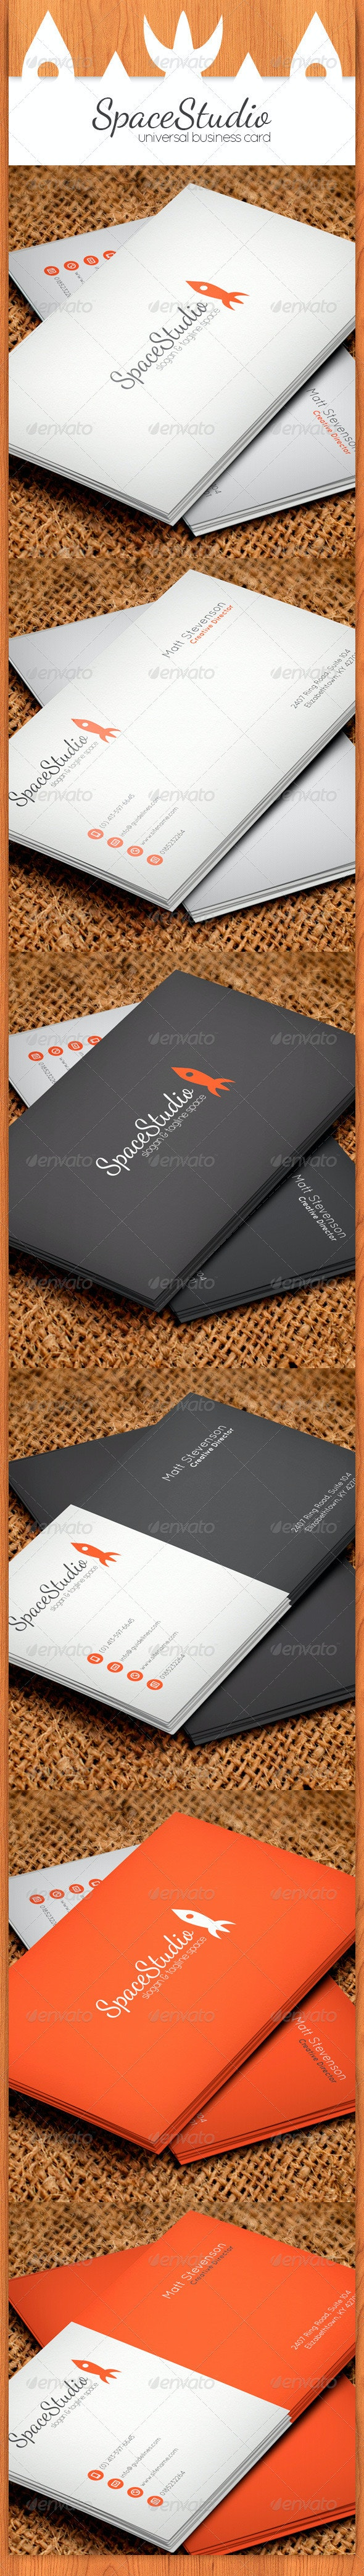 Rocket Business Card - Creative Business Cards